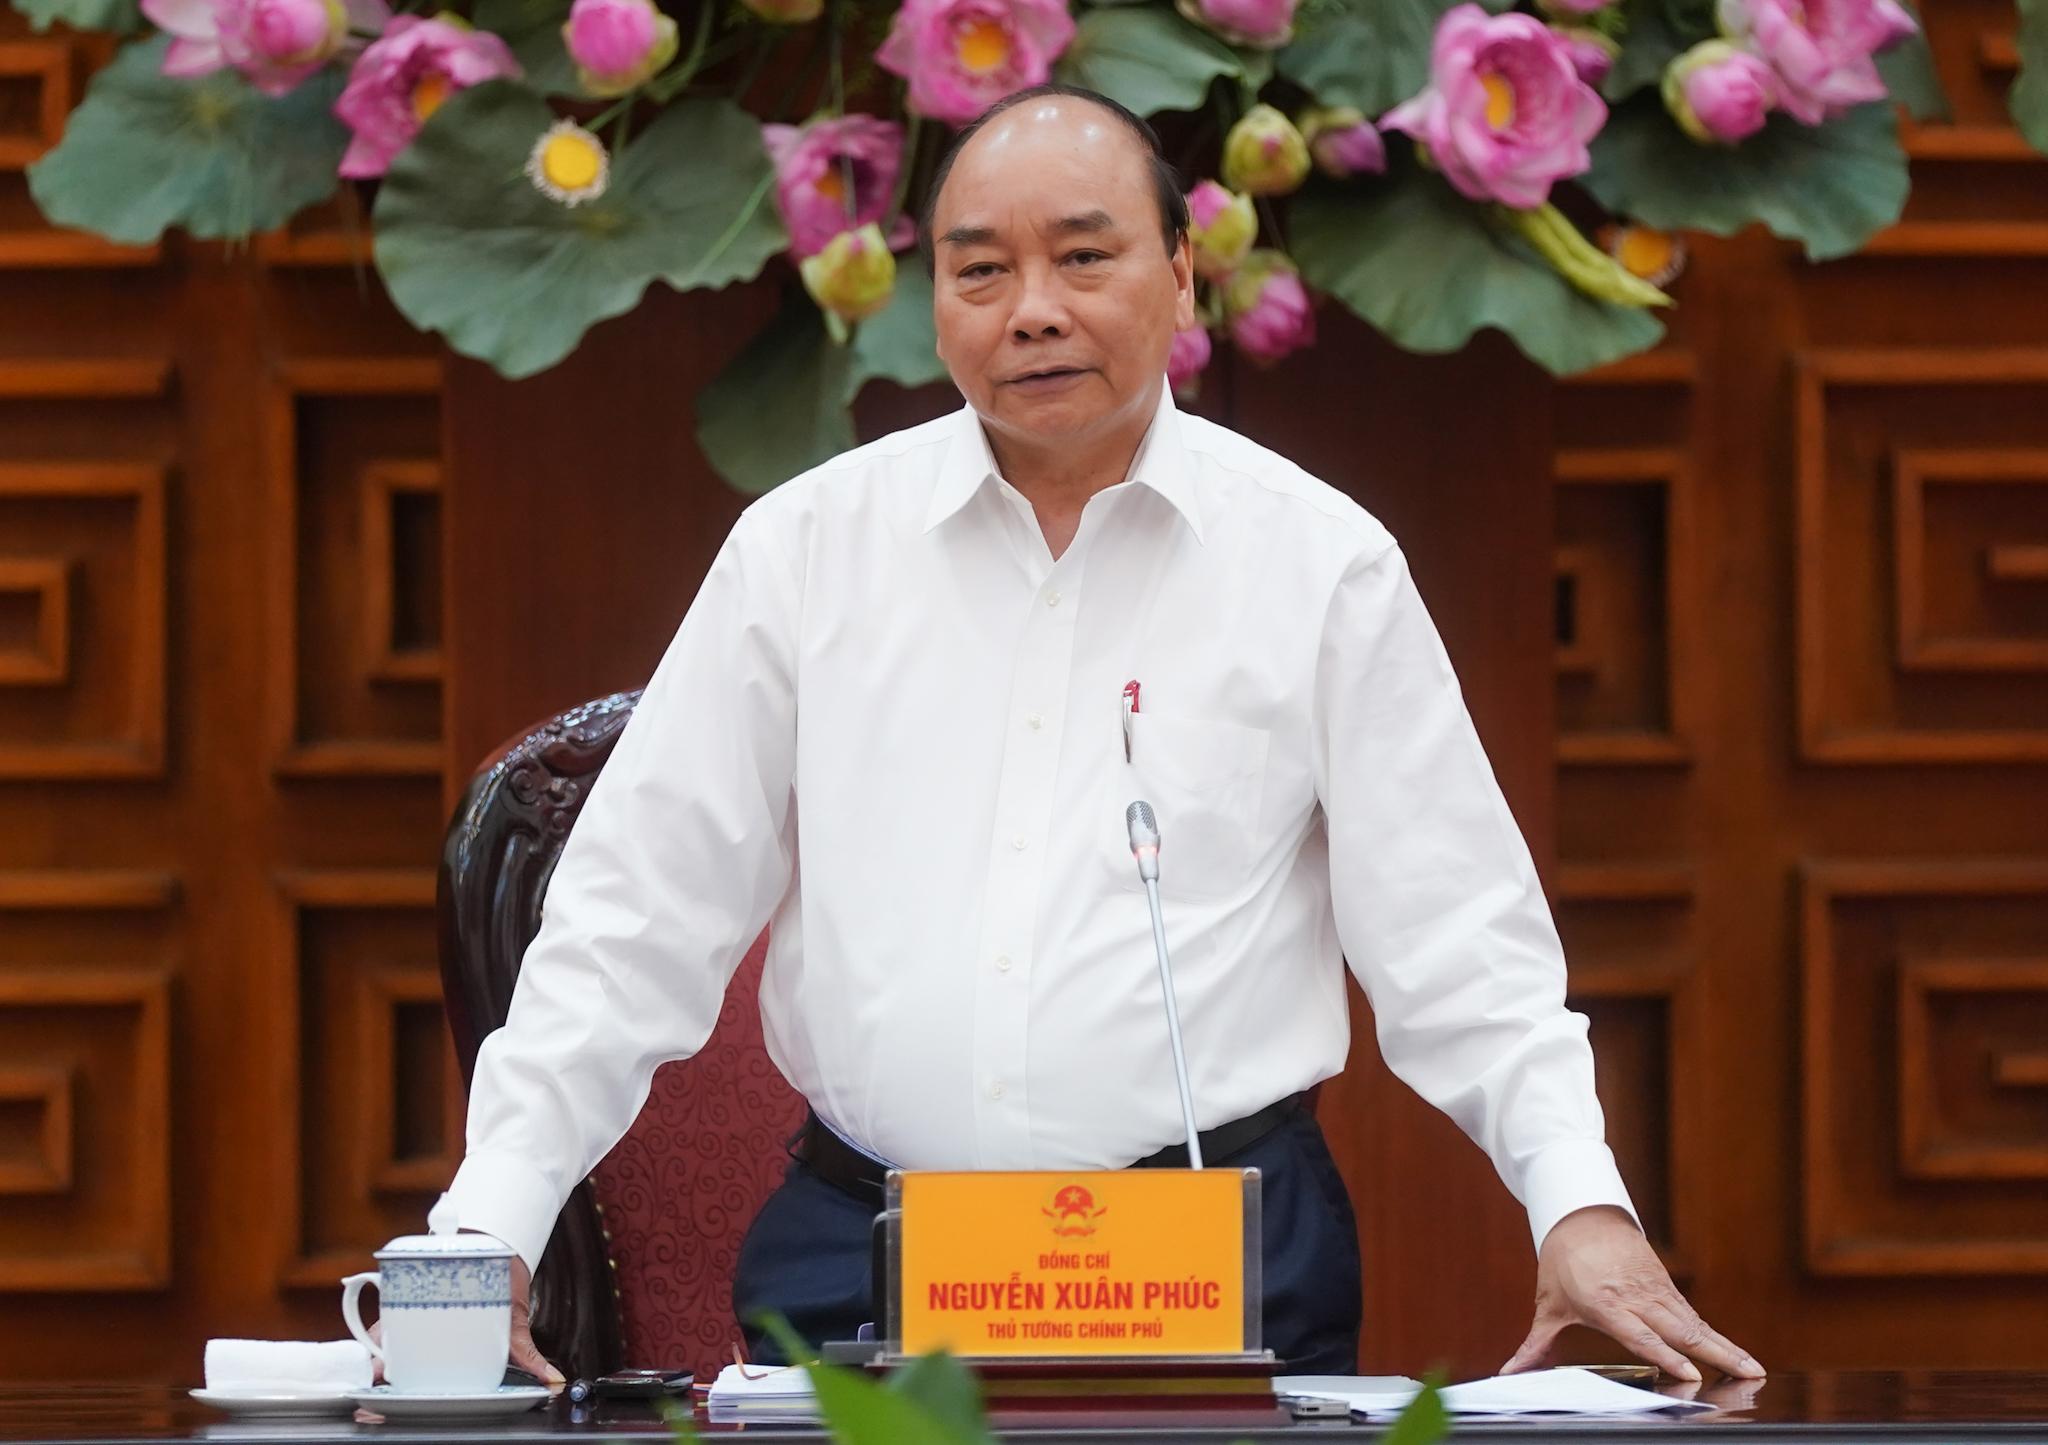 thu tuong chu tri hop thuong truc chinh phu ve co che phat trien dien